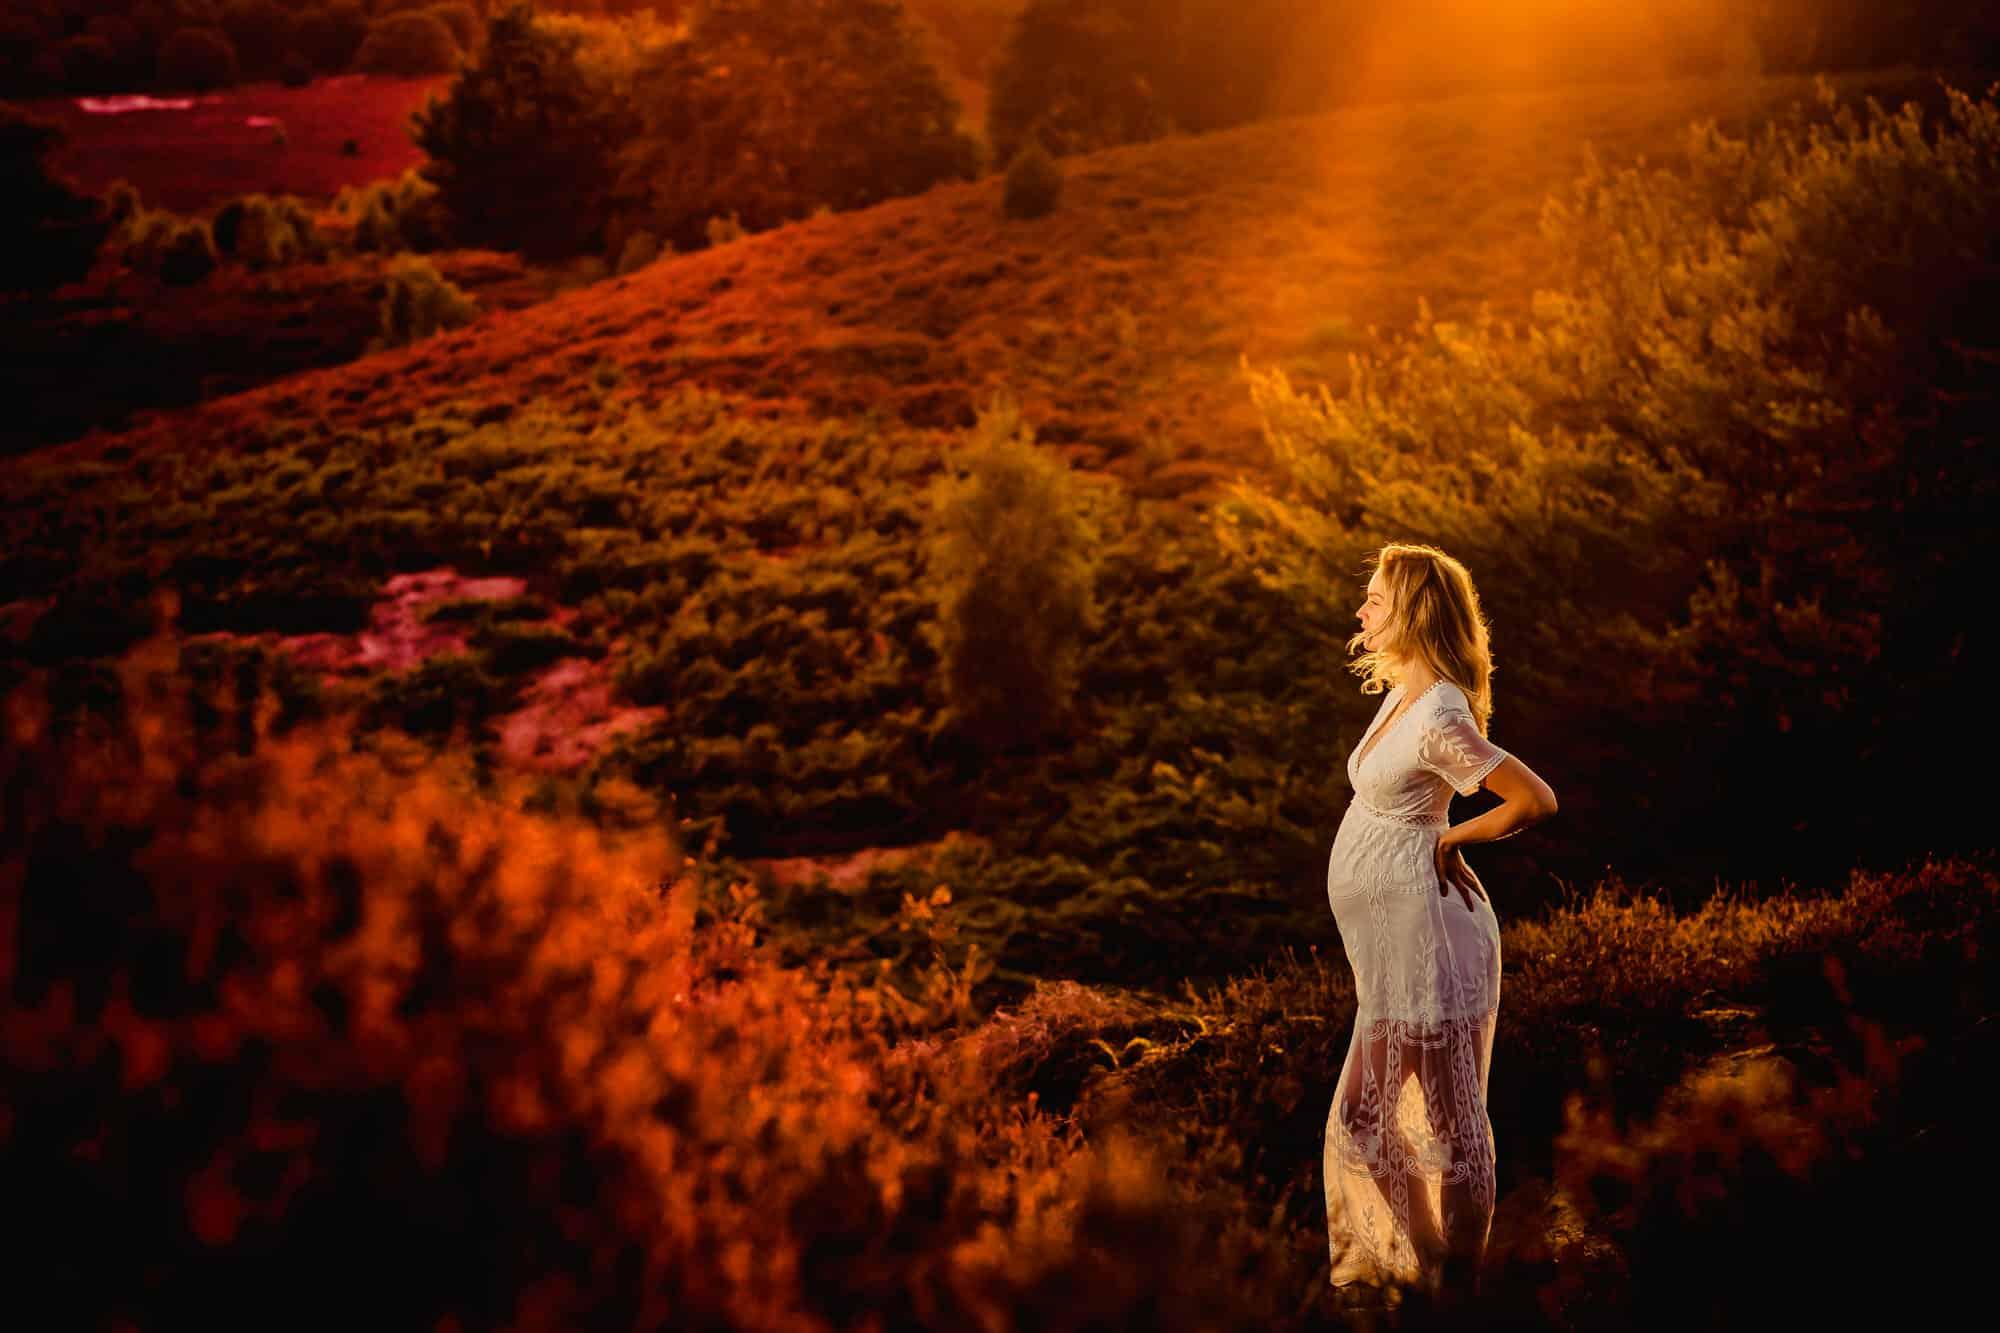 Zwangerschapsfotografie Zwangerschapsshoot, zwanger, bollebuik, geboortefotografie, newborn fotografie, zwangerschap, stijlvolle zwangerschapsfotografie